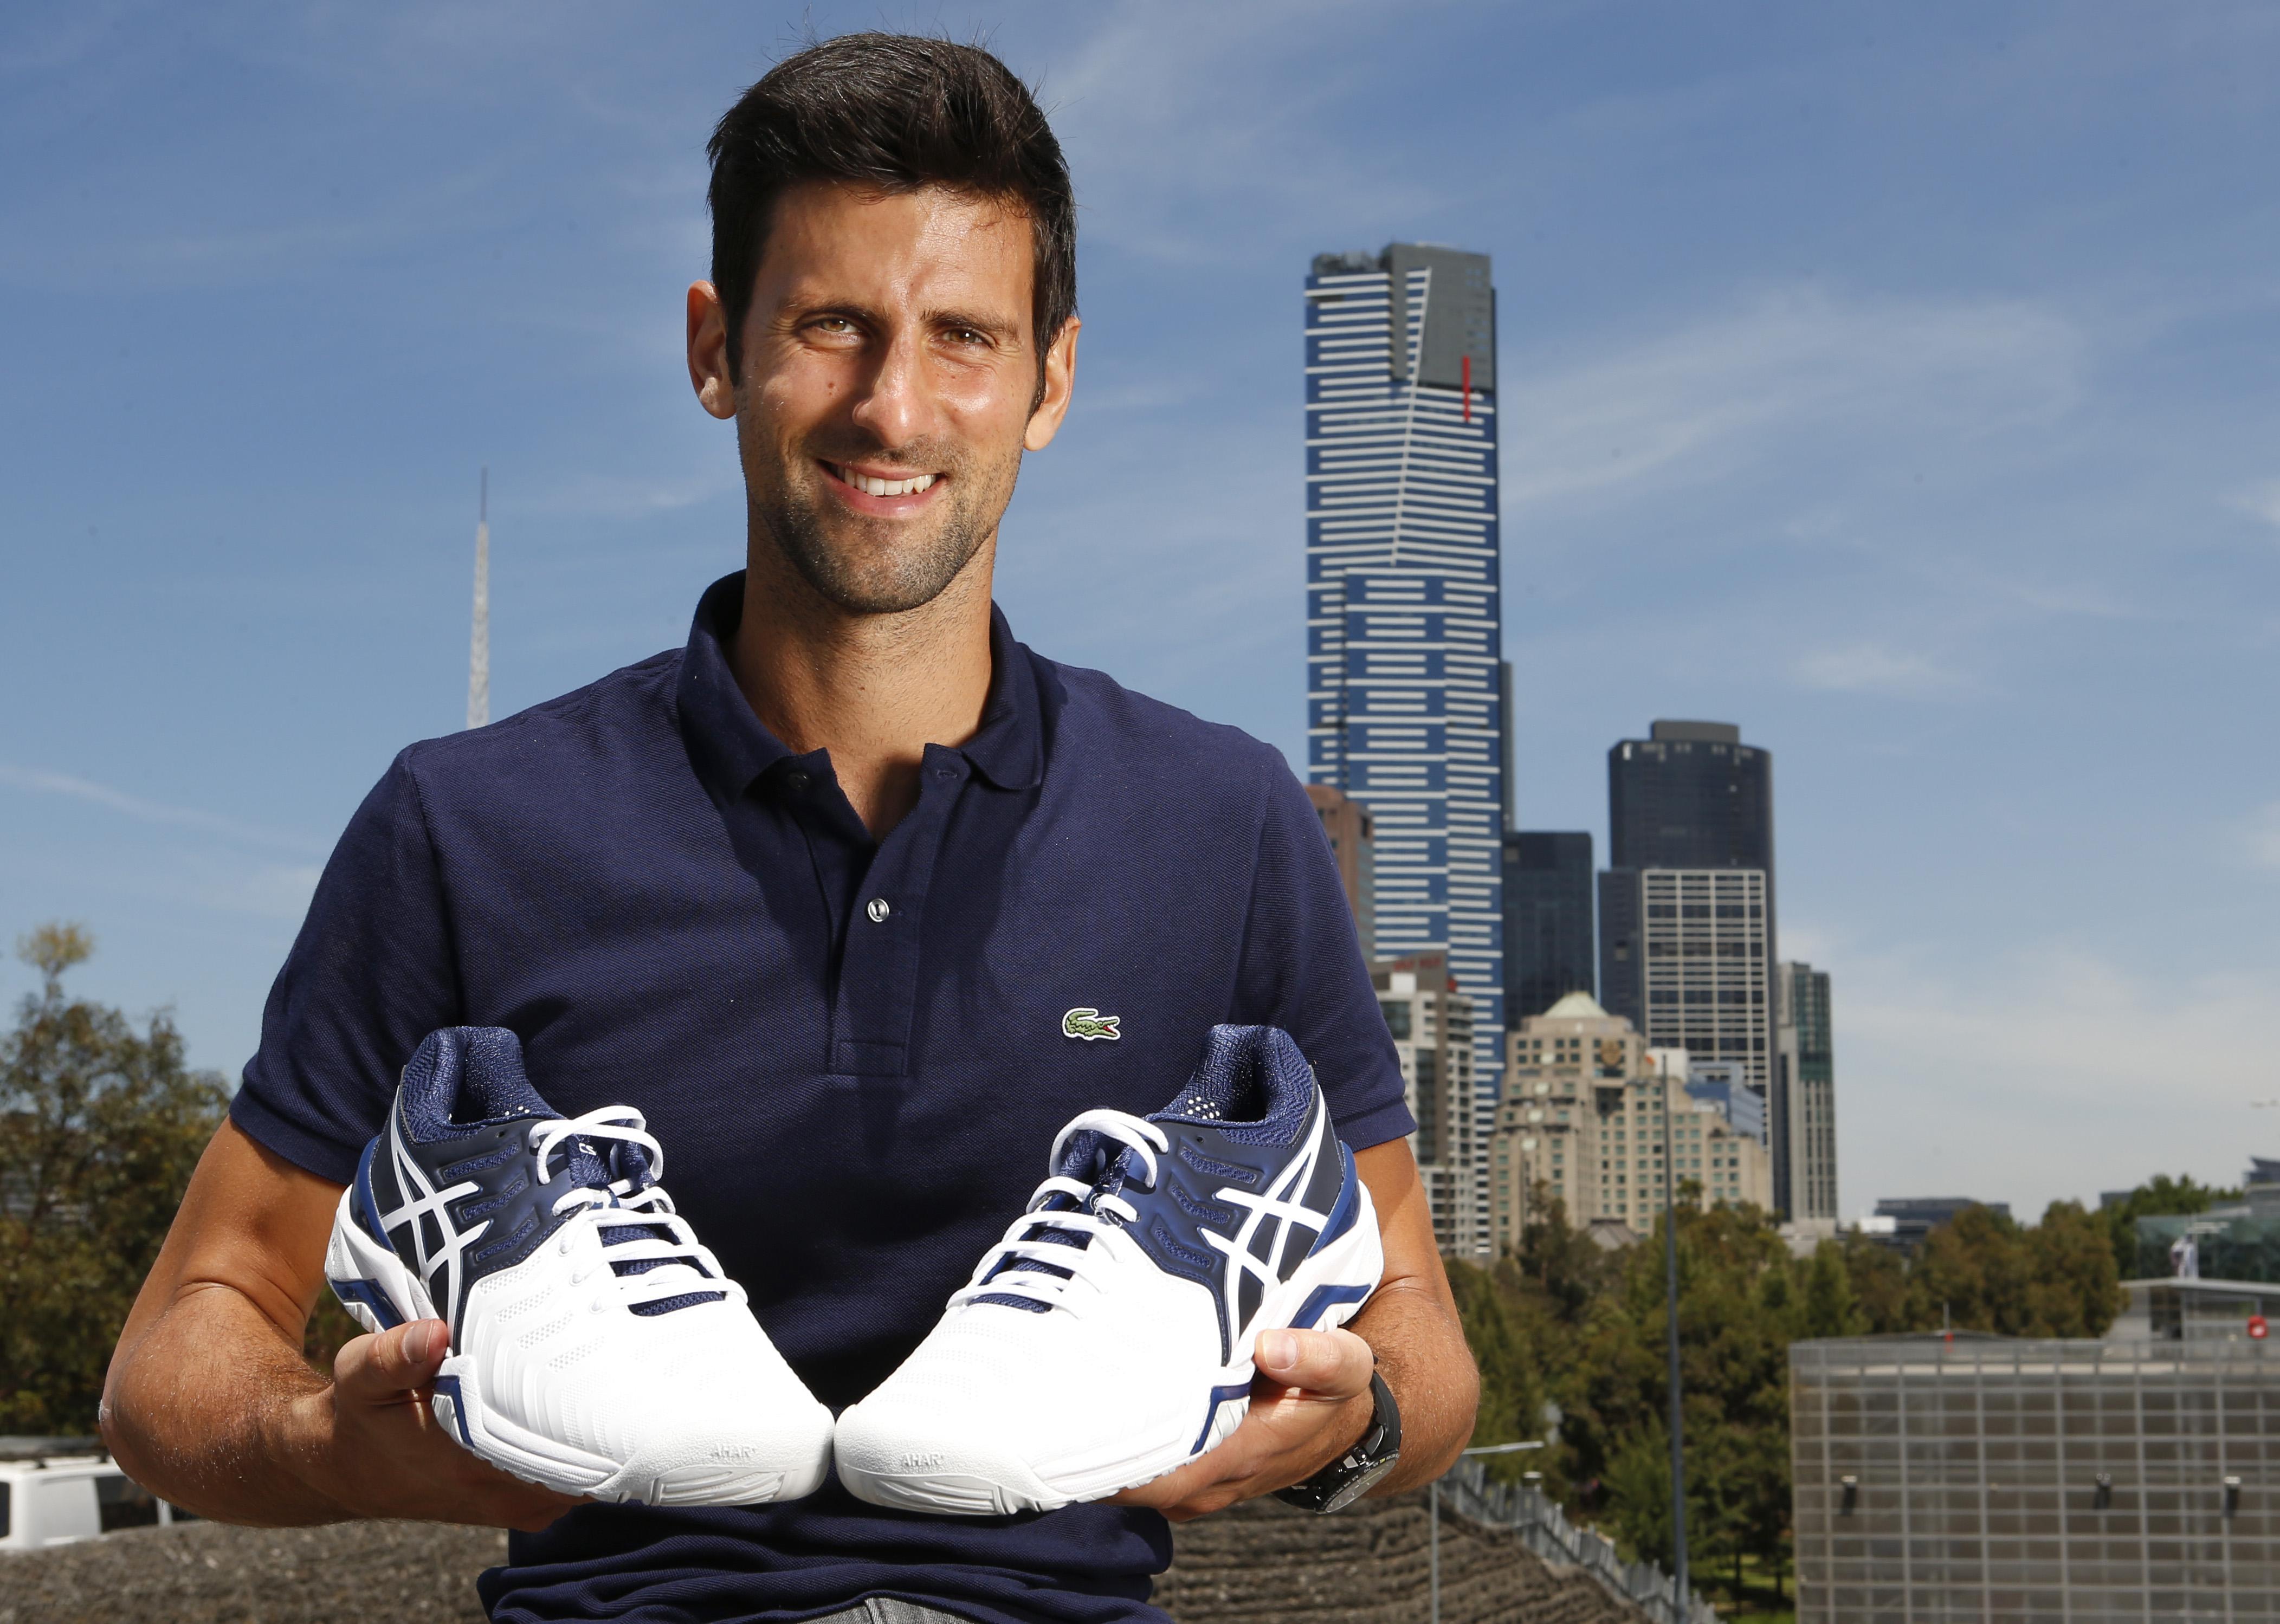 garaje secuestrar Furioso  Asics Partners With Tennis Ace Novak Djokovic In Latest Iteration Of 'I  Move Me' Campaign - B&T